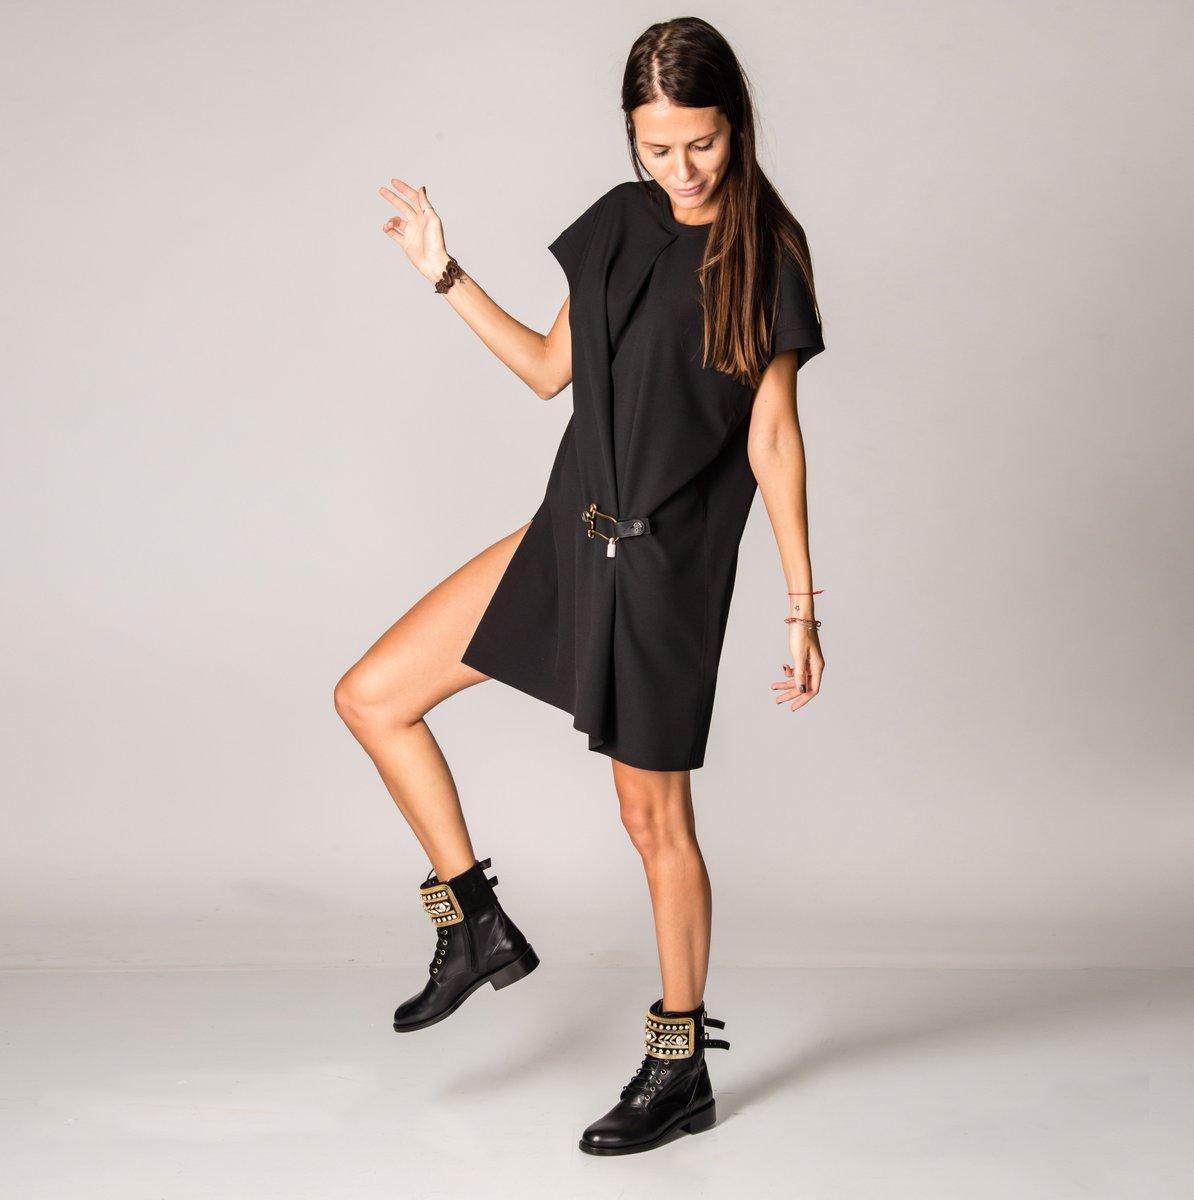 Платье @BALENCIAGA , ботинки @ReneCaovilla. Купить онлайн: https://t.co/C2X0K2qLmw https://t.co/a2t3W8B5KE